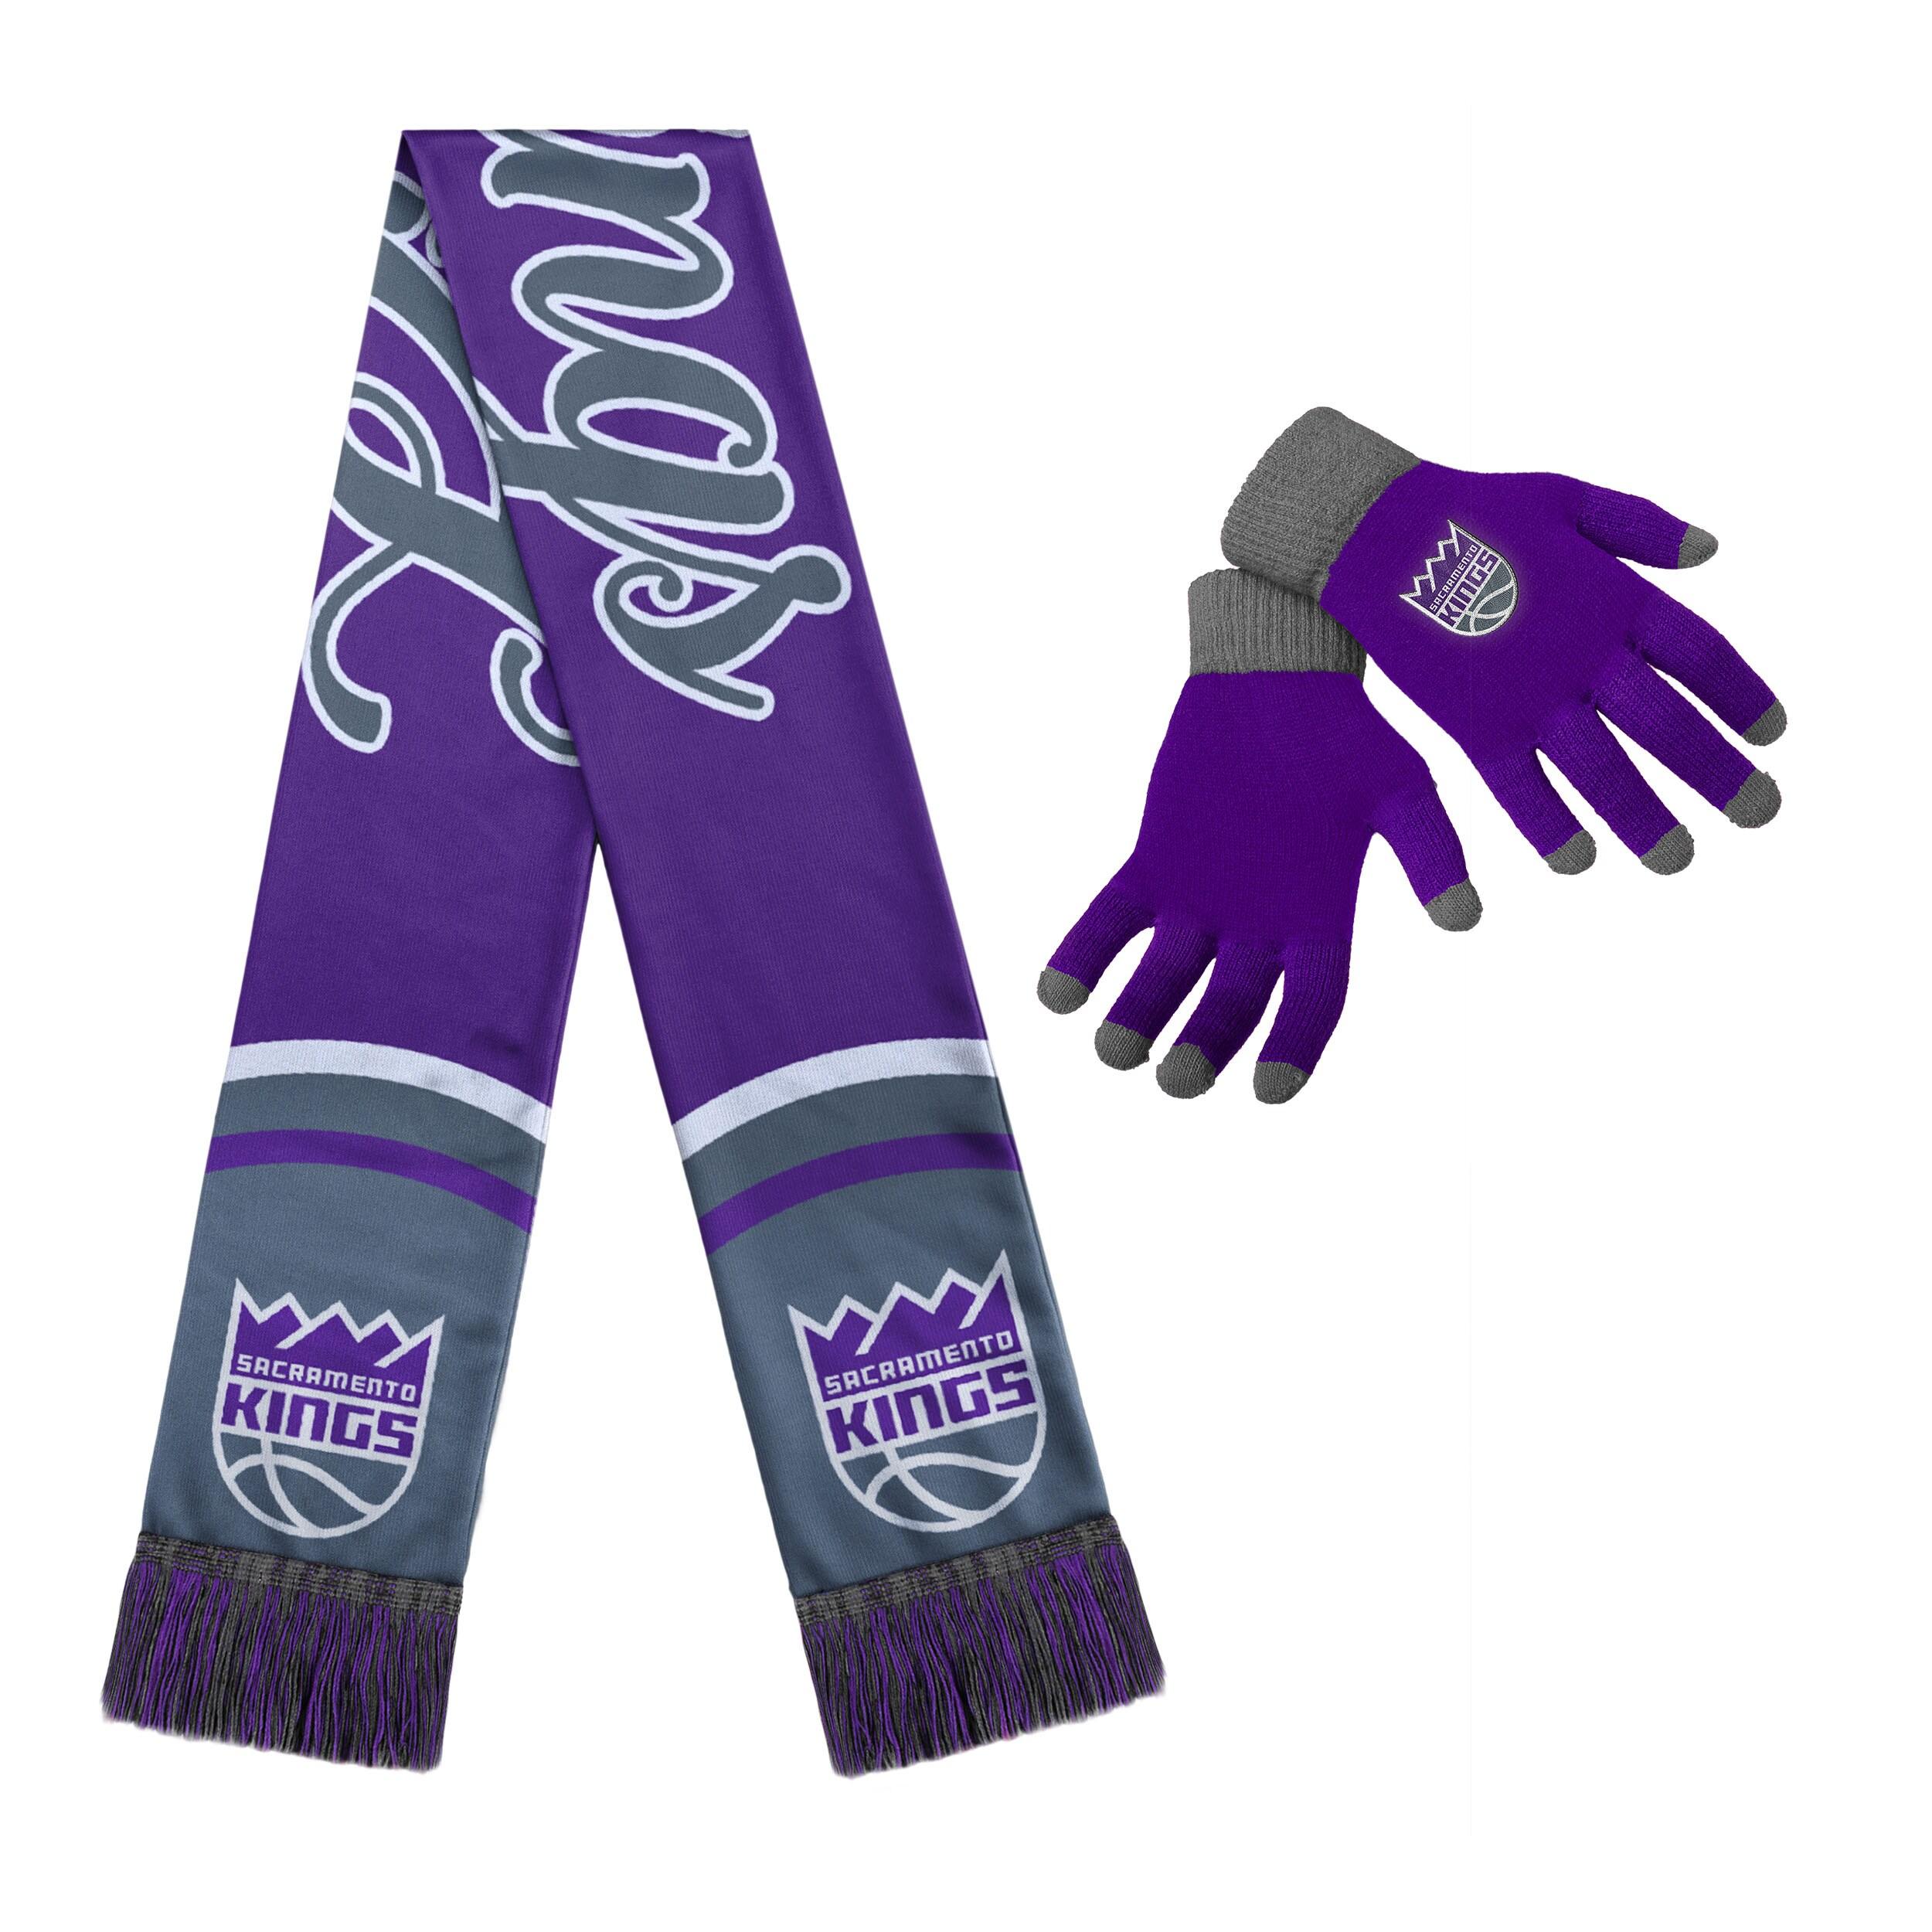 Sacramento Kings Women's Glove and Scarf Set